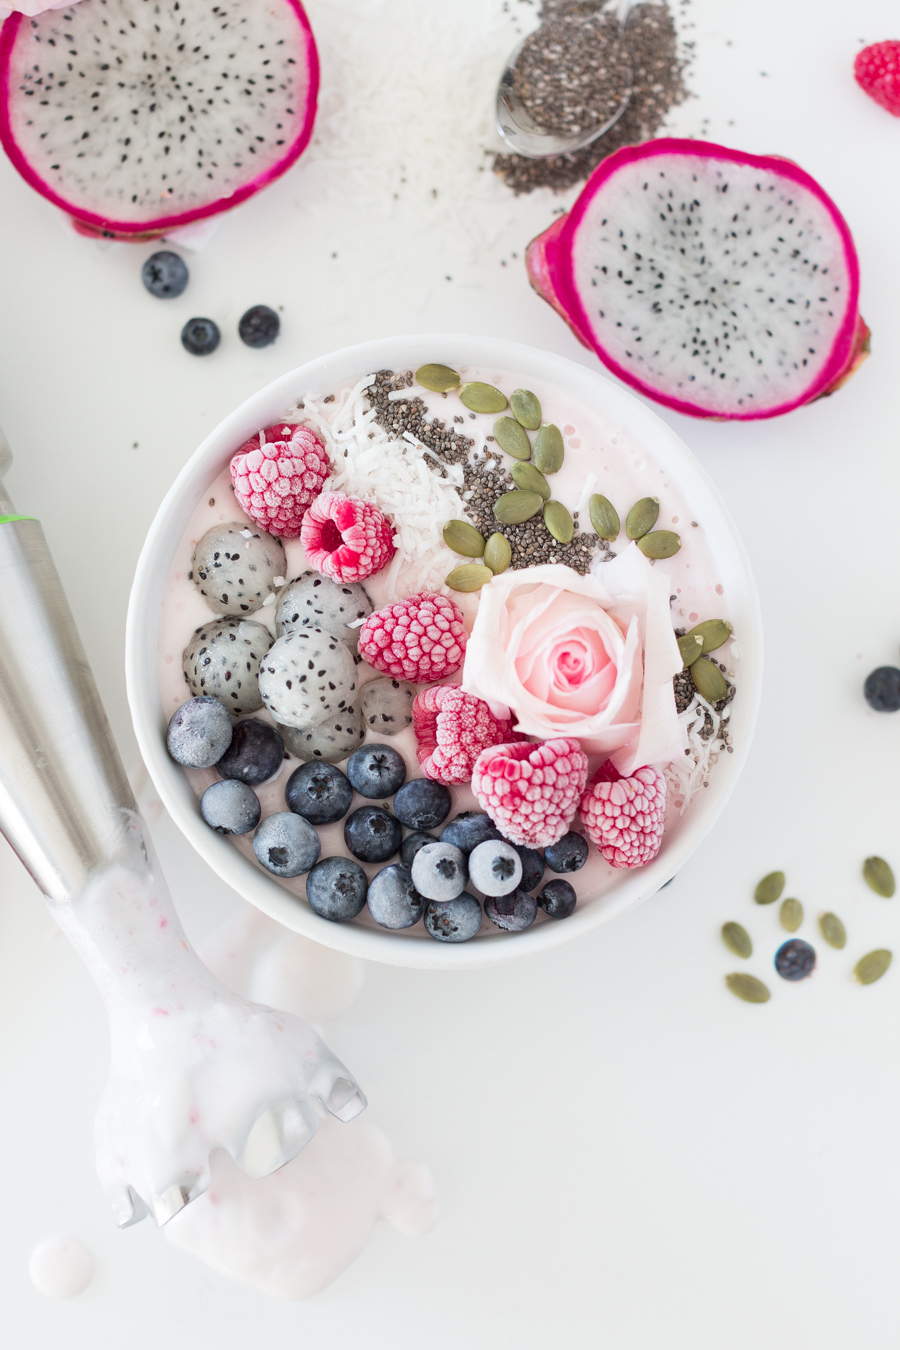 raspberrychiaseedsmoothiebowlcraftberrybush-9